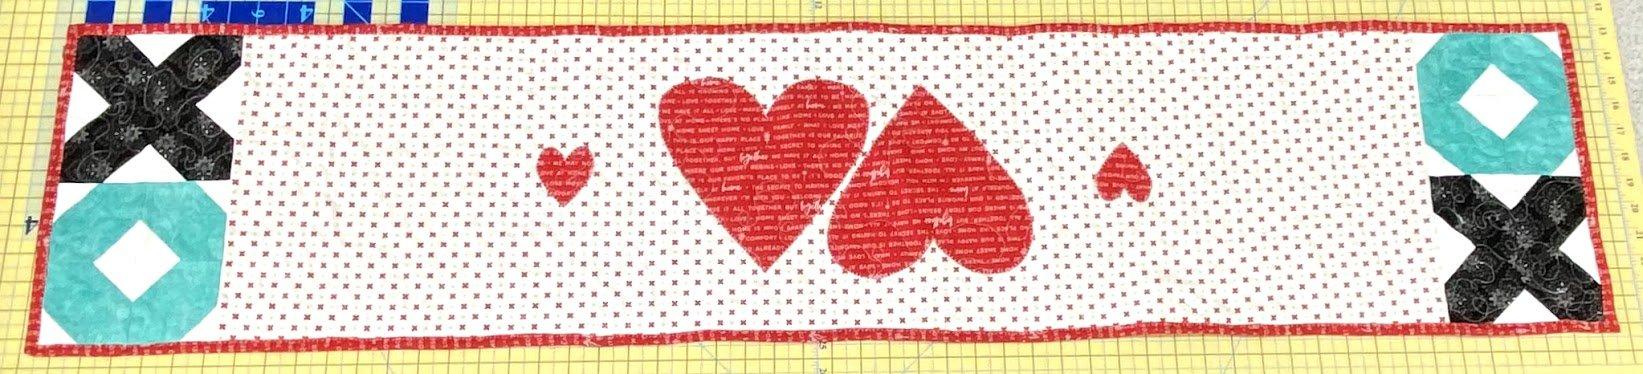 Warm Your Heart Table Runner Kit